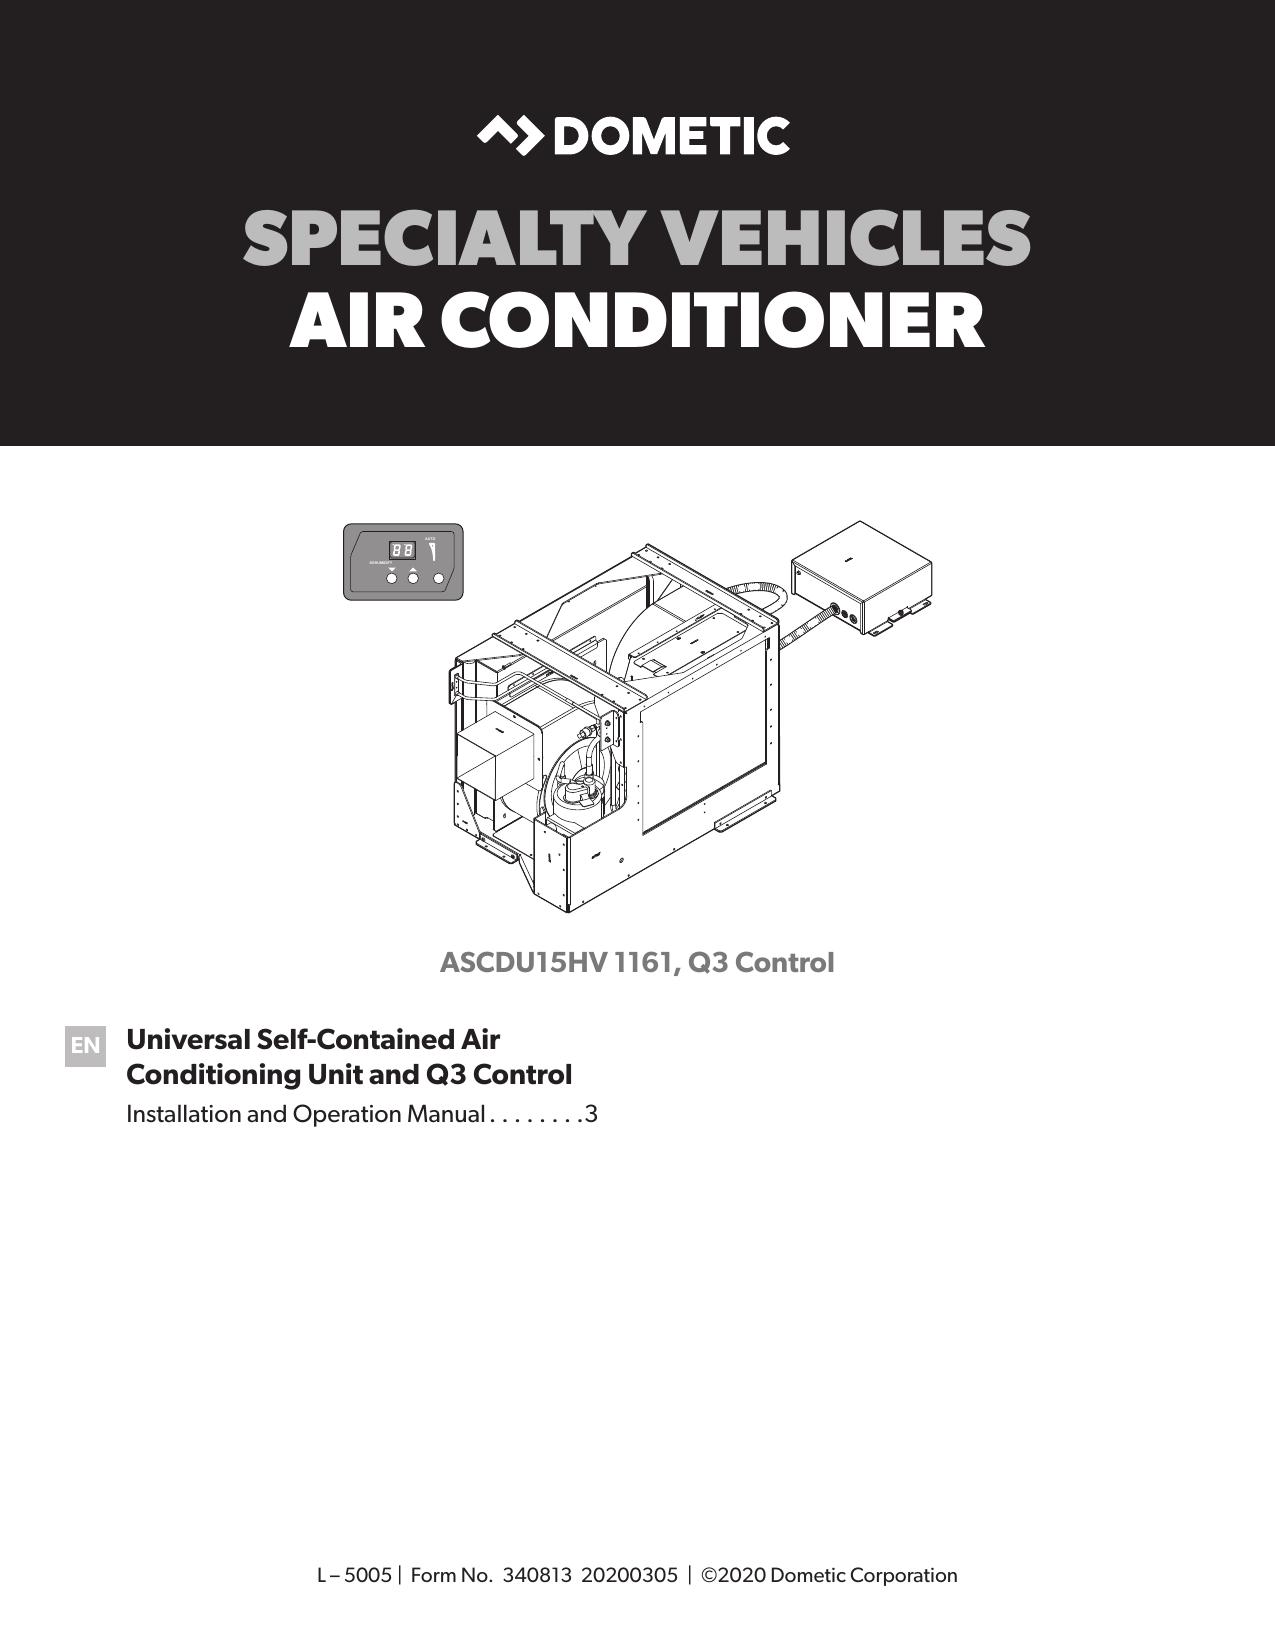 Dometic 15000 Btu Rv Air Conditioner Wiring Diagram